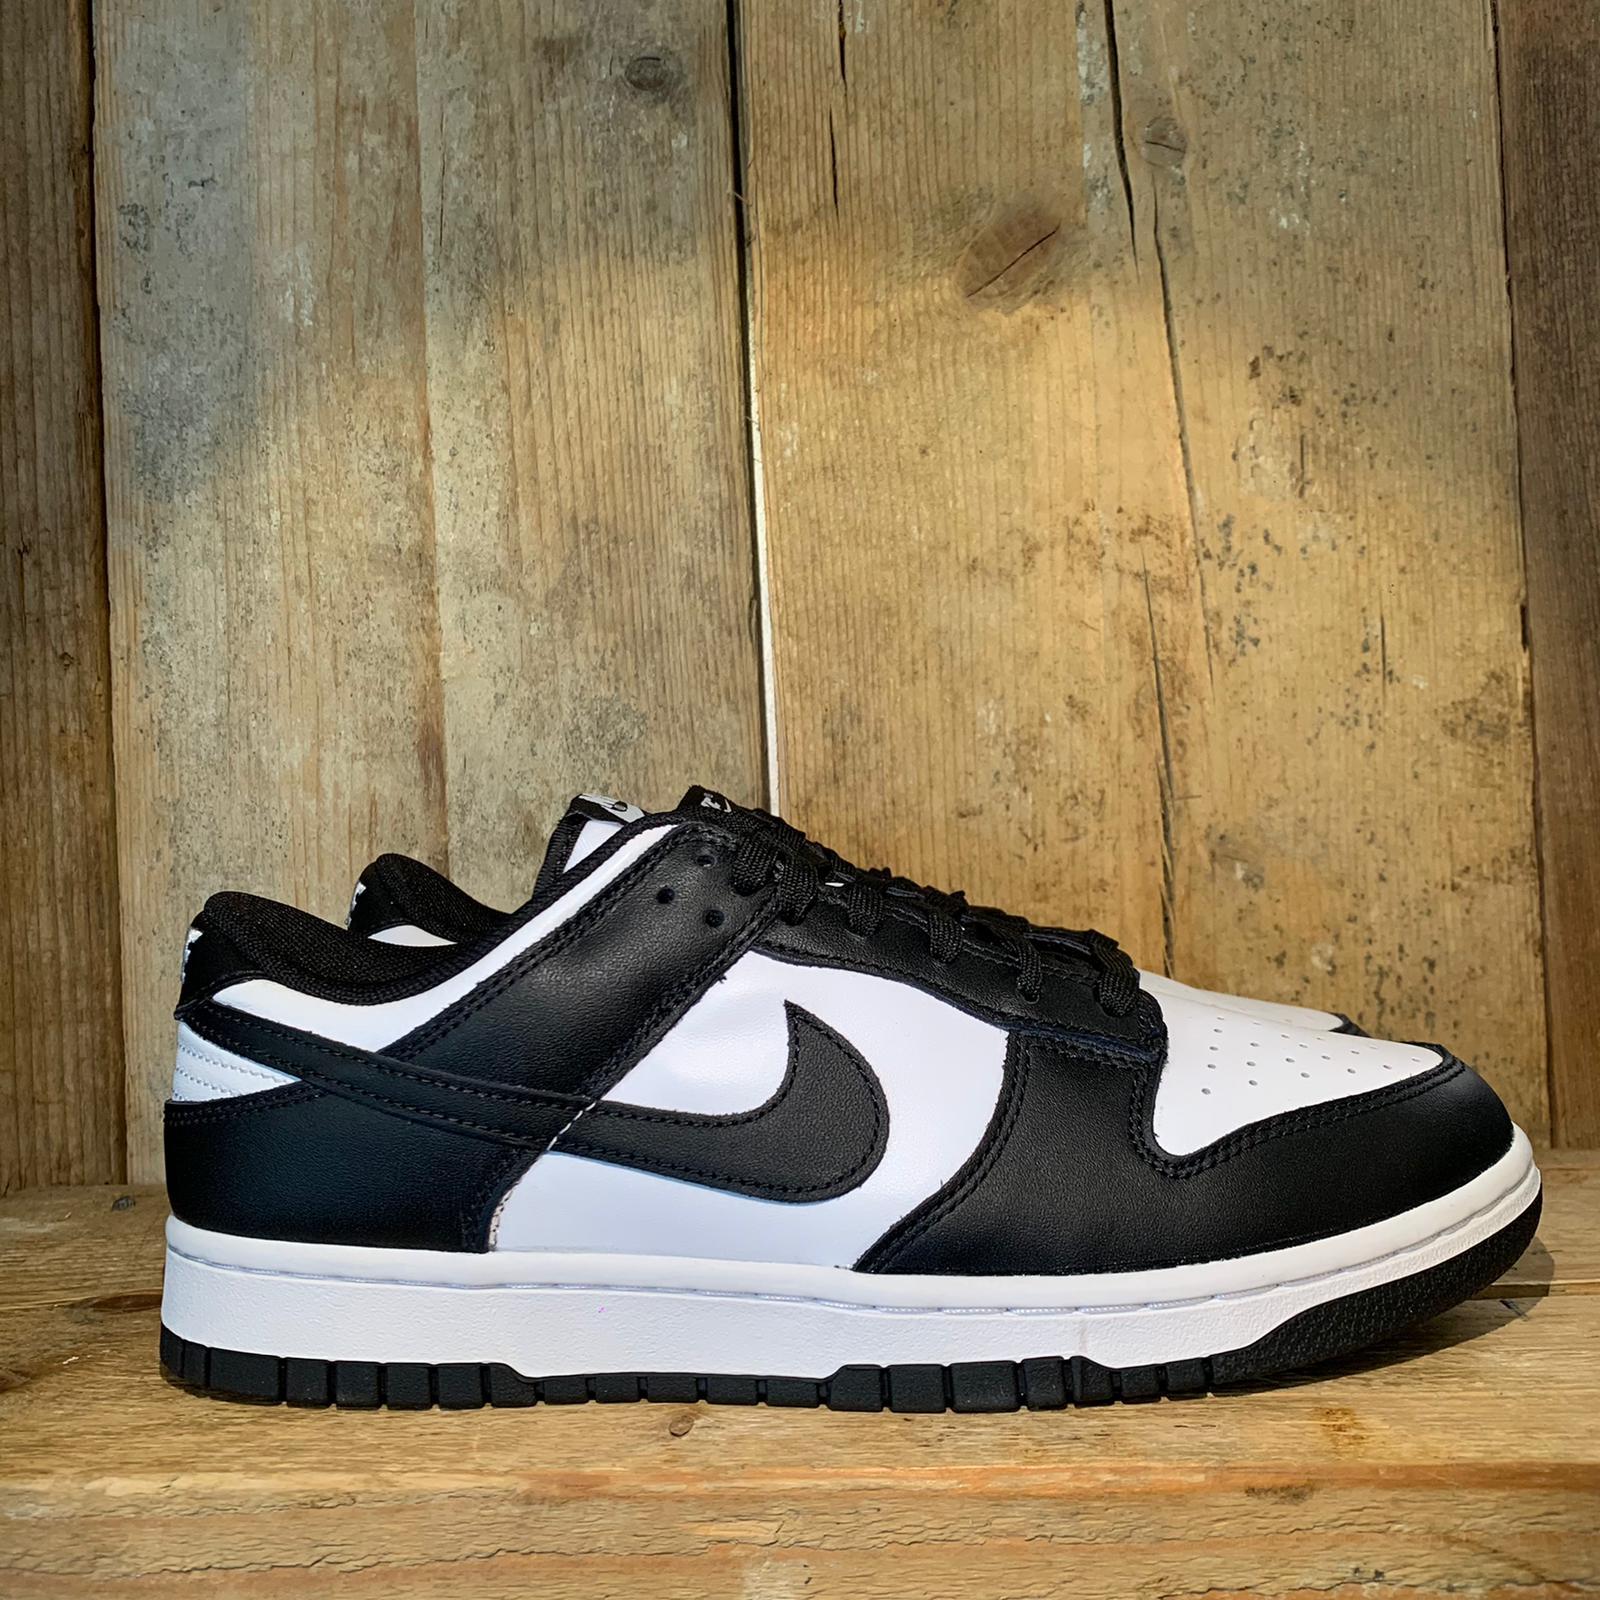 Scarpa Nike Dunk Low Retro White Black